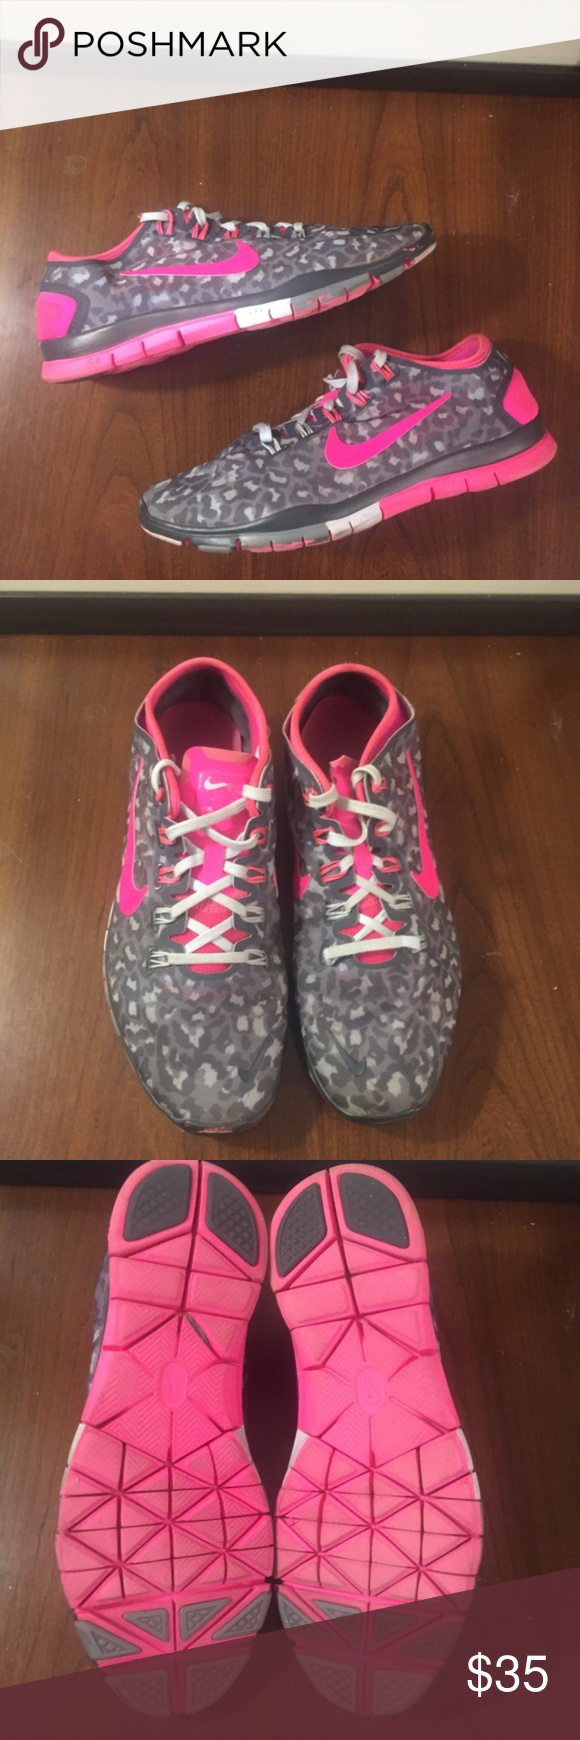 912b837f2fbc ... new zealand nike free tr connect 2 running shoe 8.5 10ce6 377aa